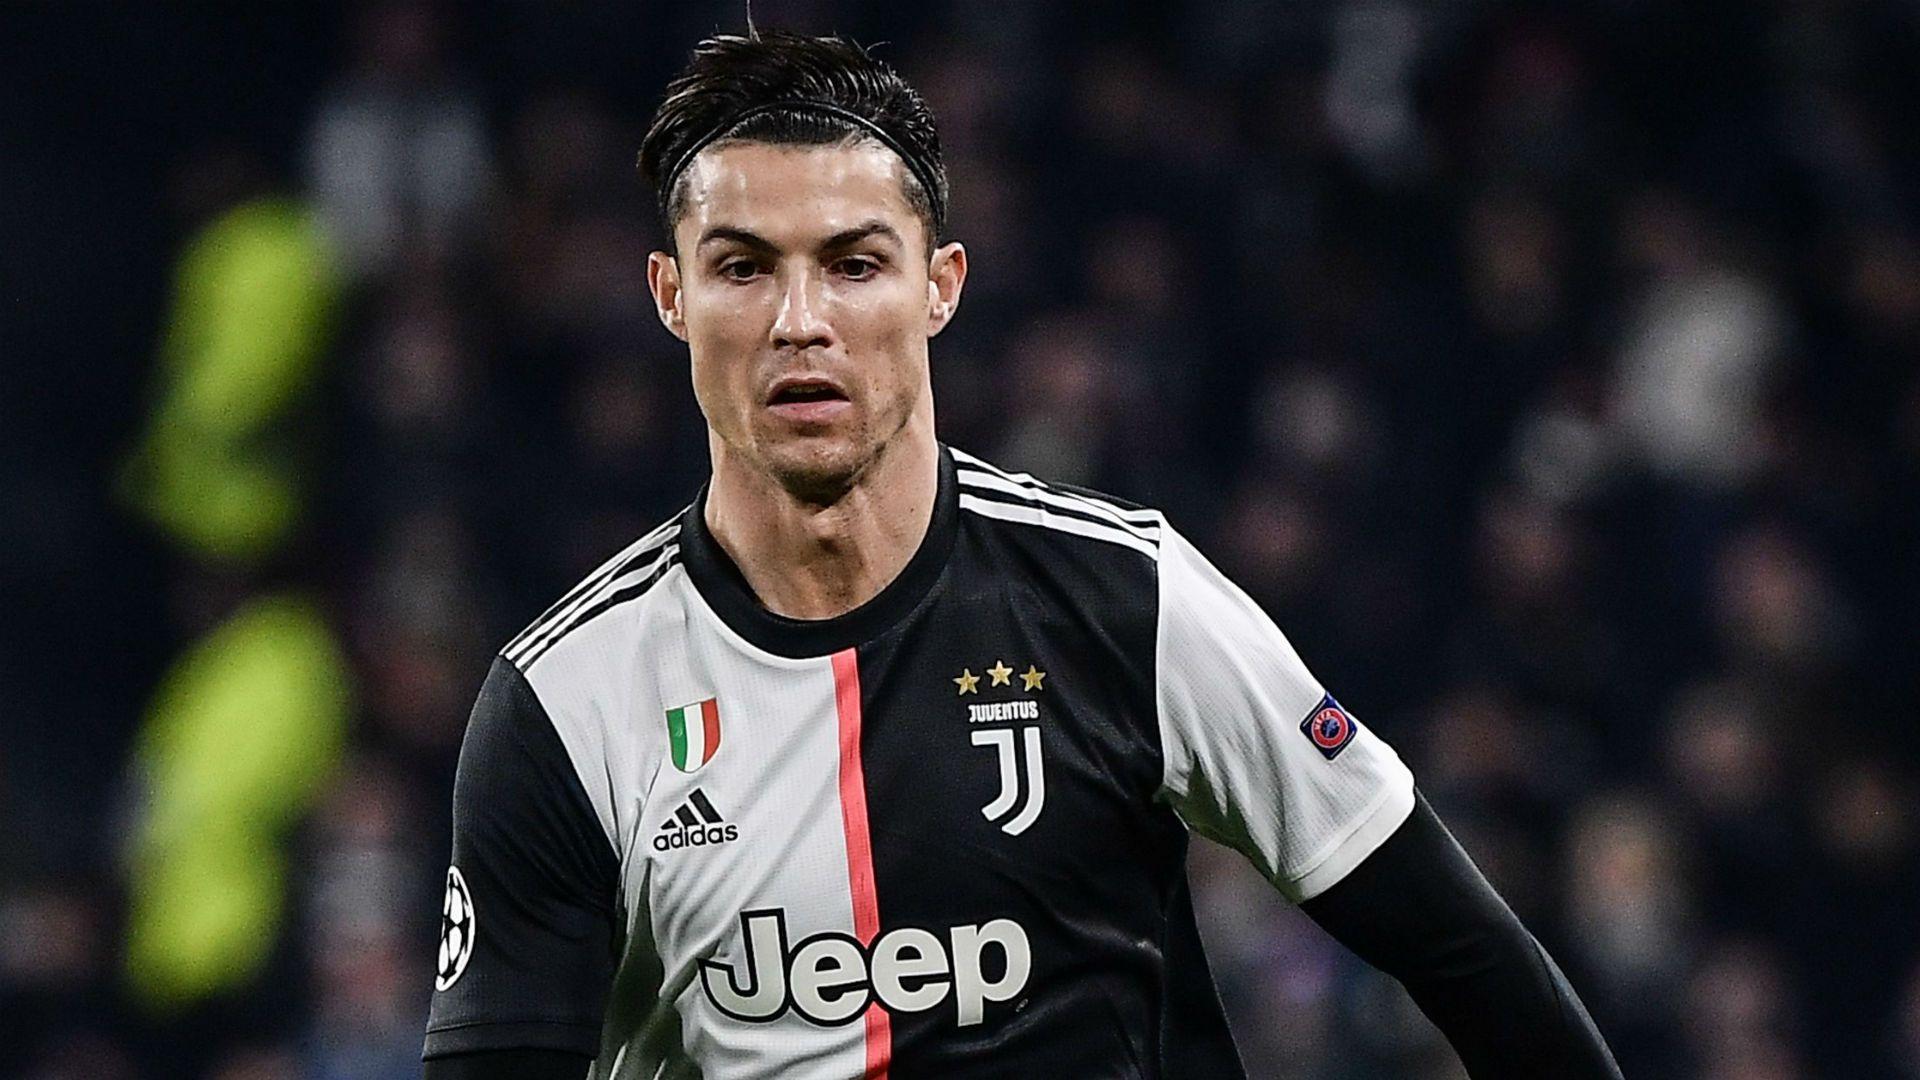 Cristiano Ronaldo leads financial donations to amateur clubs - Sports Leo